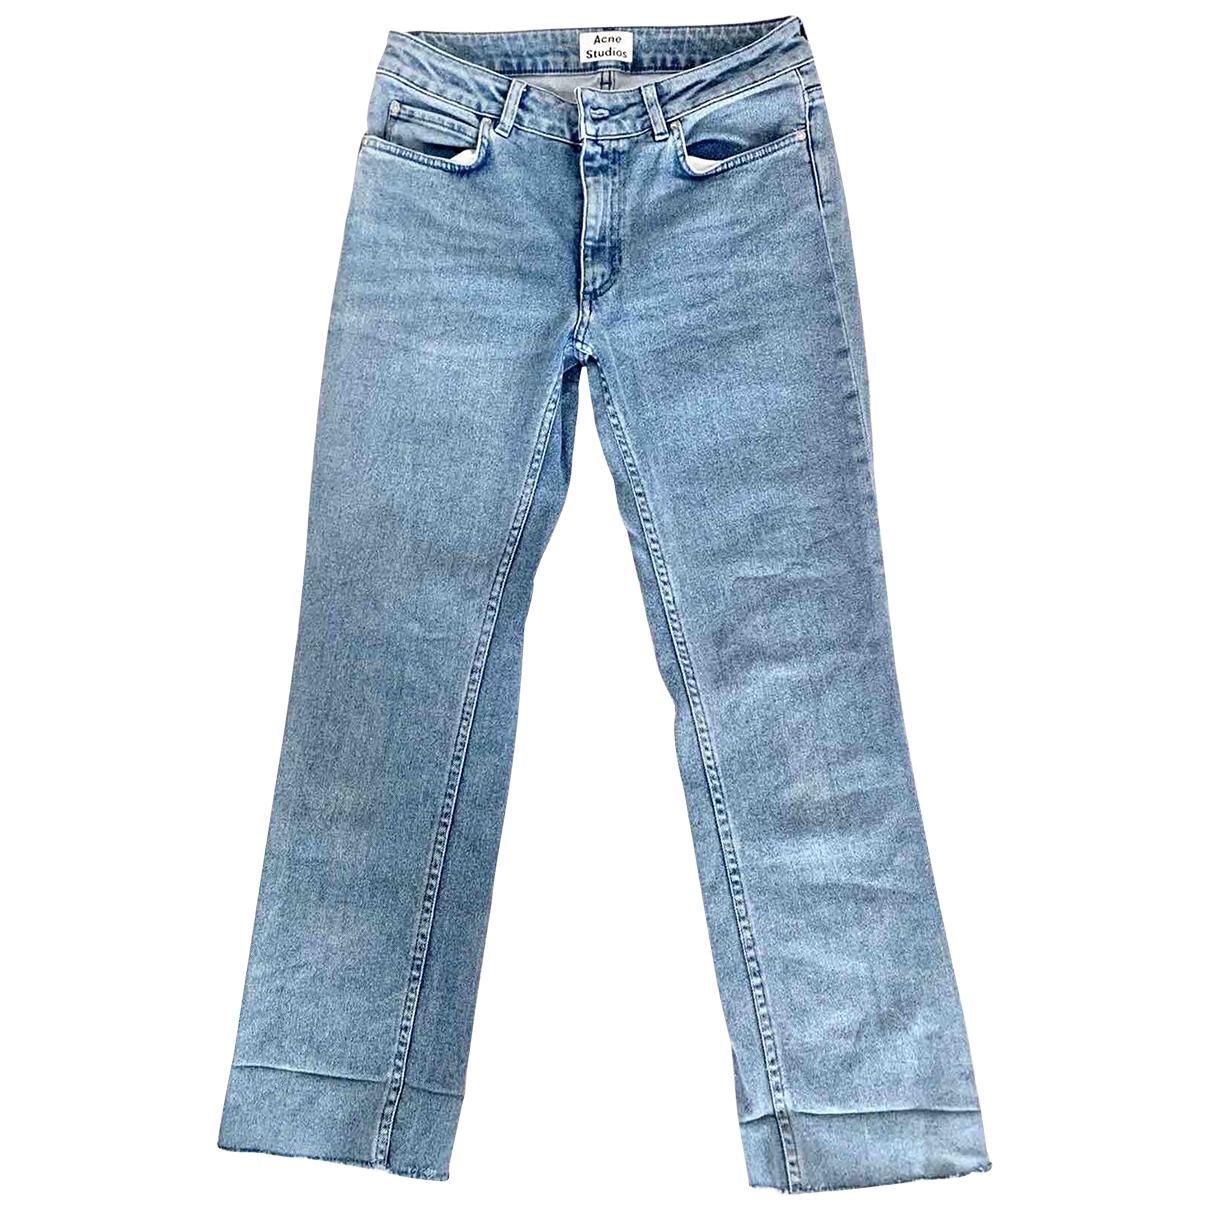 Acne Studios \N Blue Cotton - elasthane Jeans for Women 38 FR